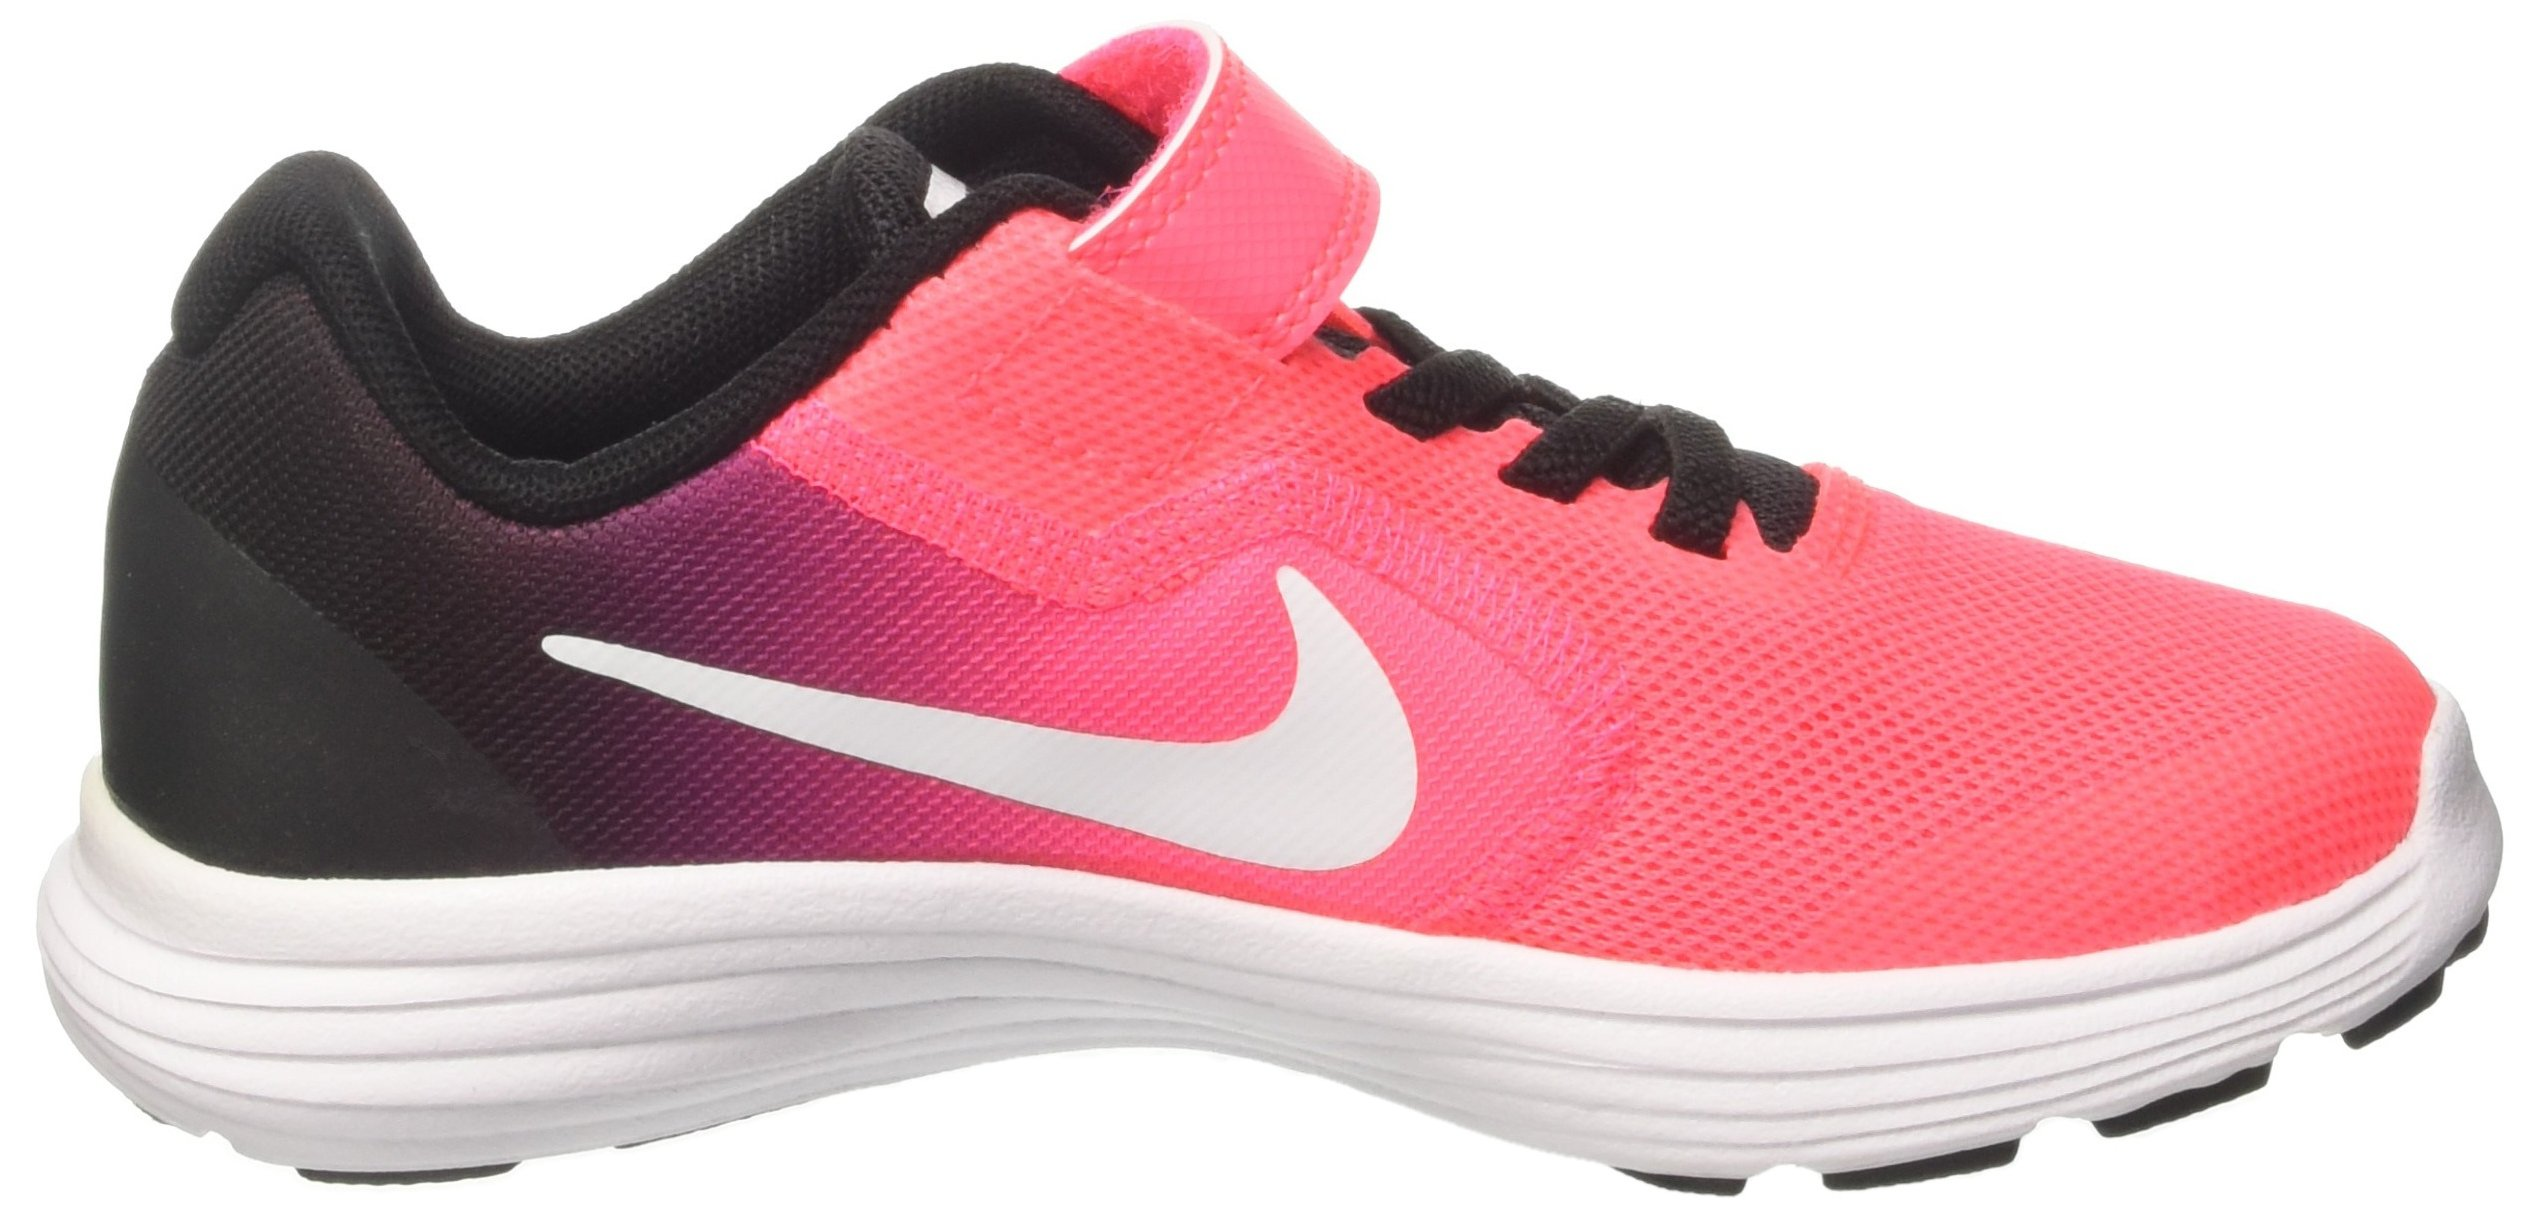 NIKE Kids' Revolution 3 (Psv) Running-Shoes, Black/White/Racer Pink/Black, 1.5 M US Little Kid by Nike (Image #6)